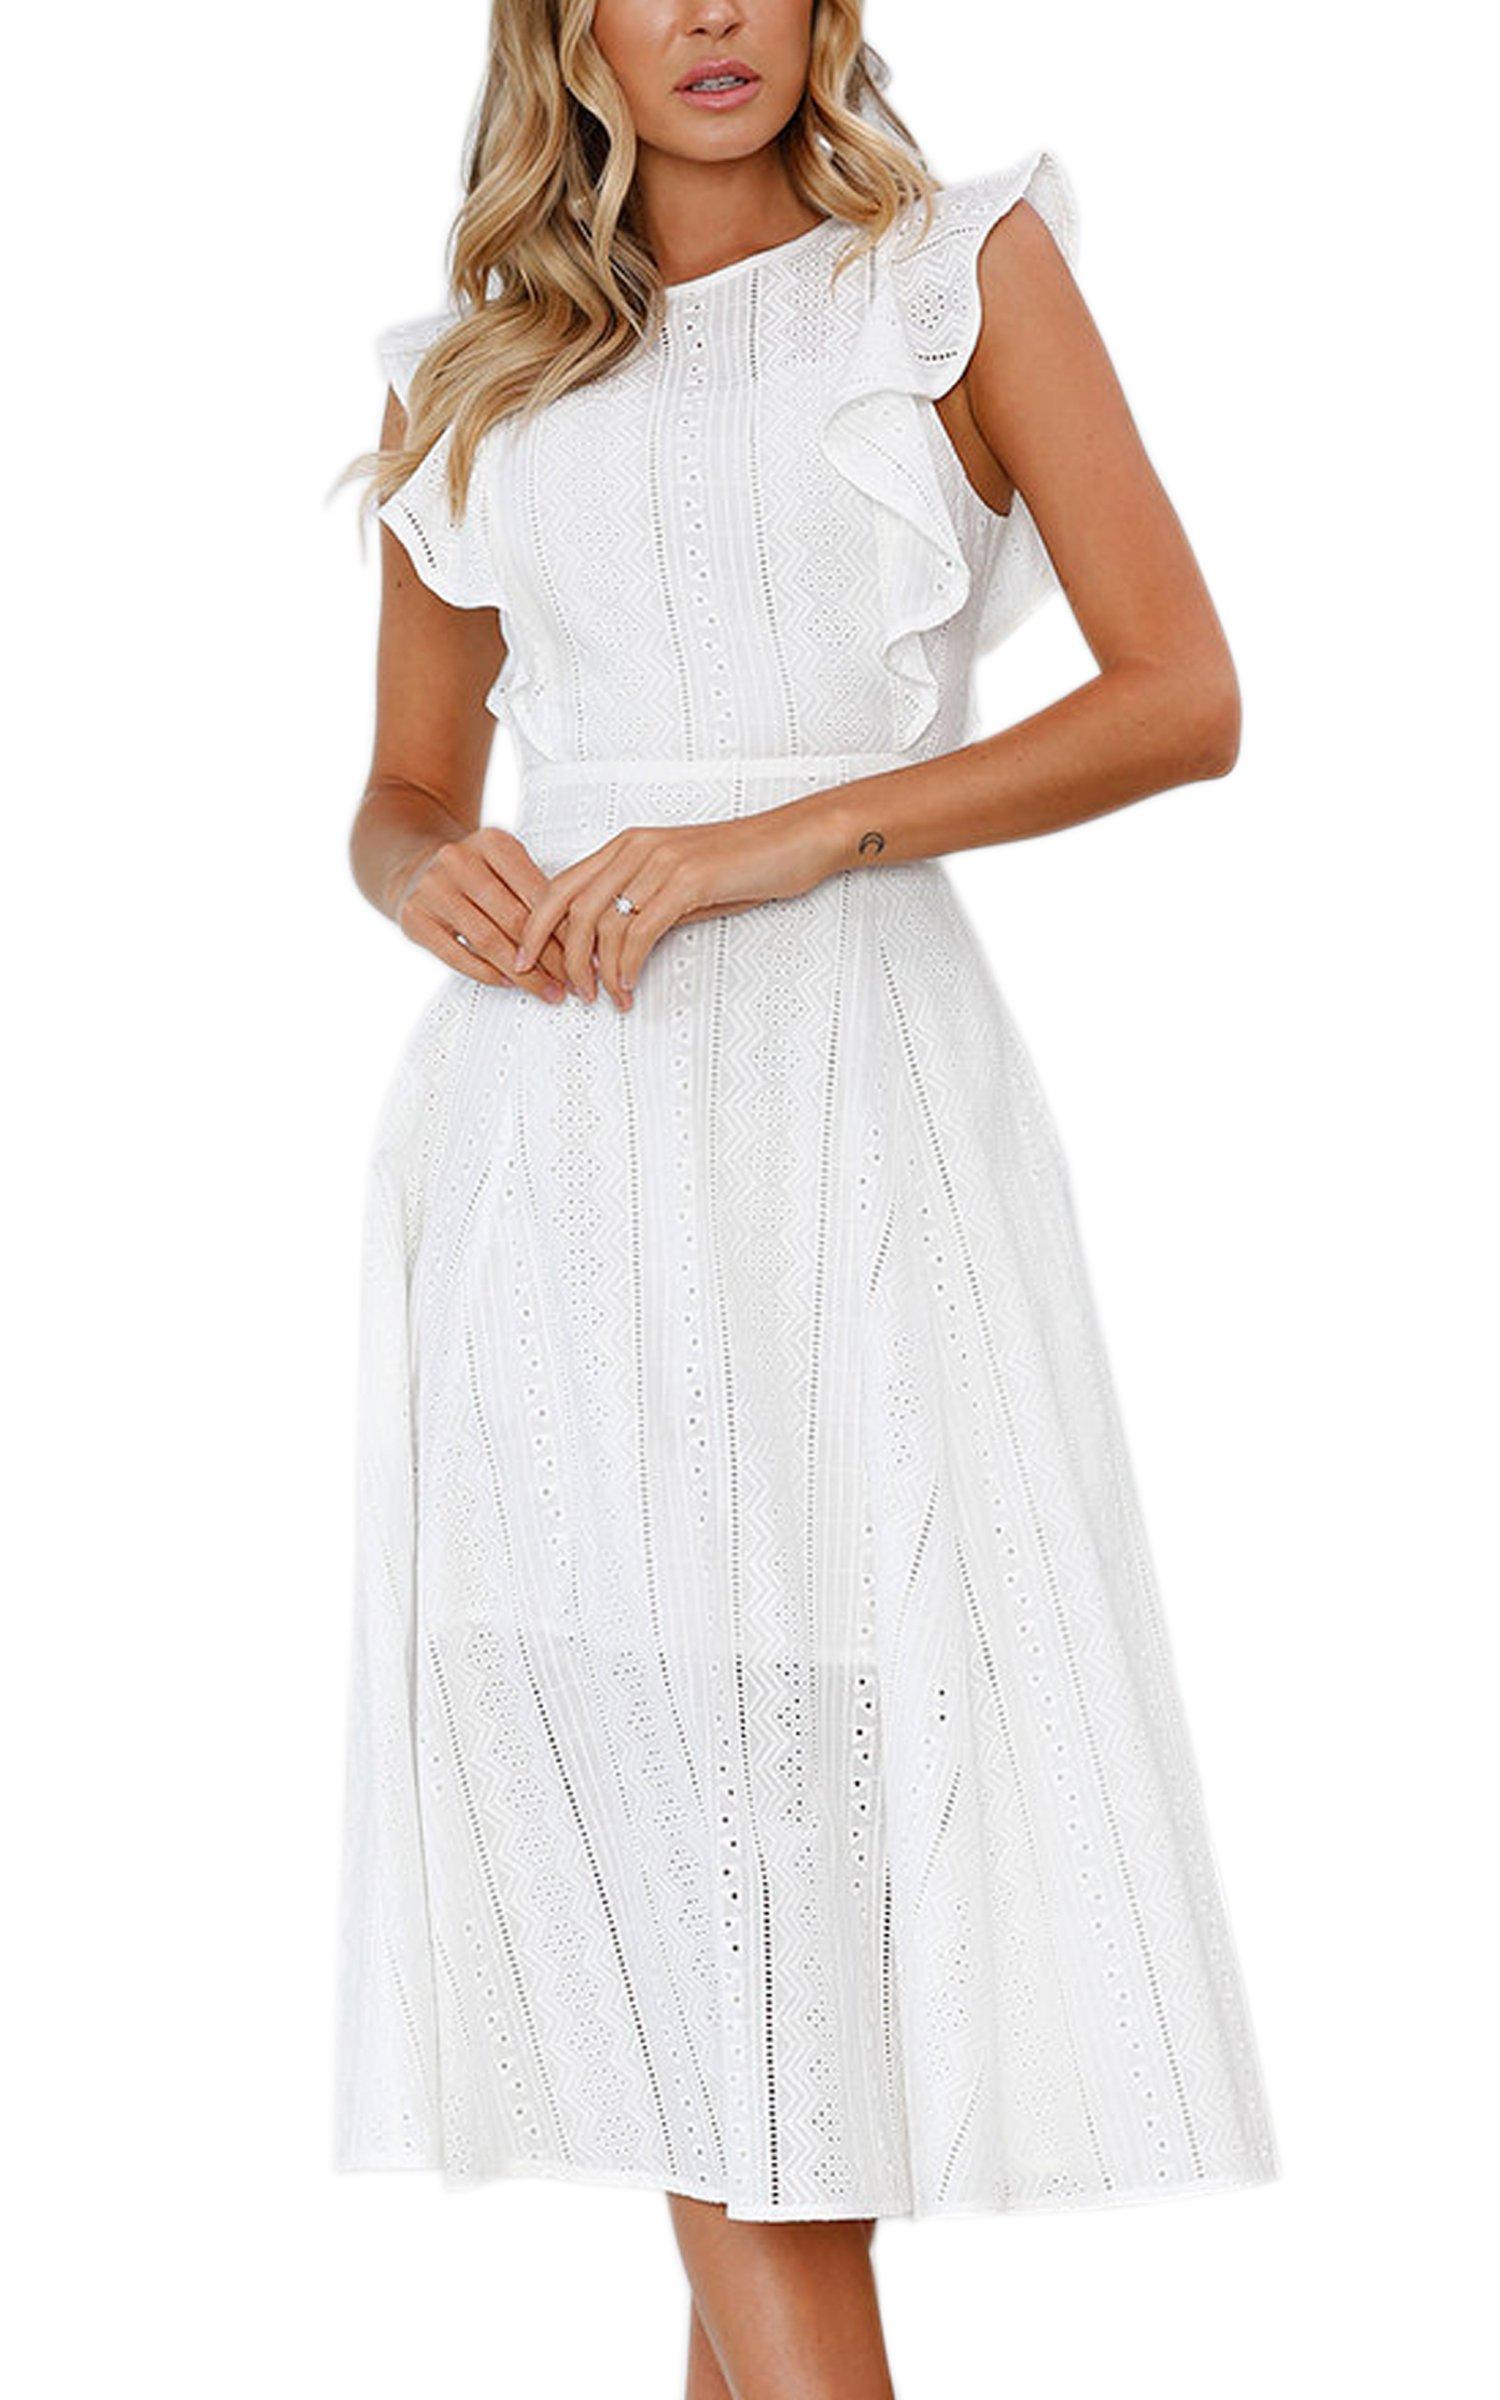 White Dress - Women's Lace Off Shoulder Cocktail Hi-Lo Bridesmaid Swing Dress